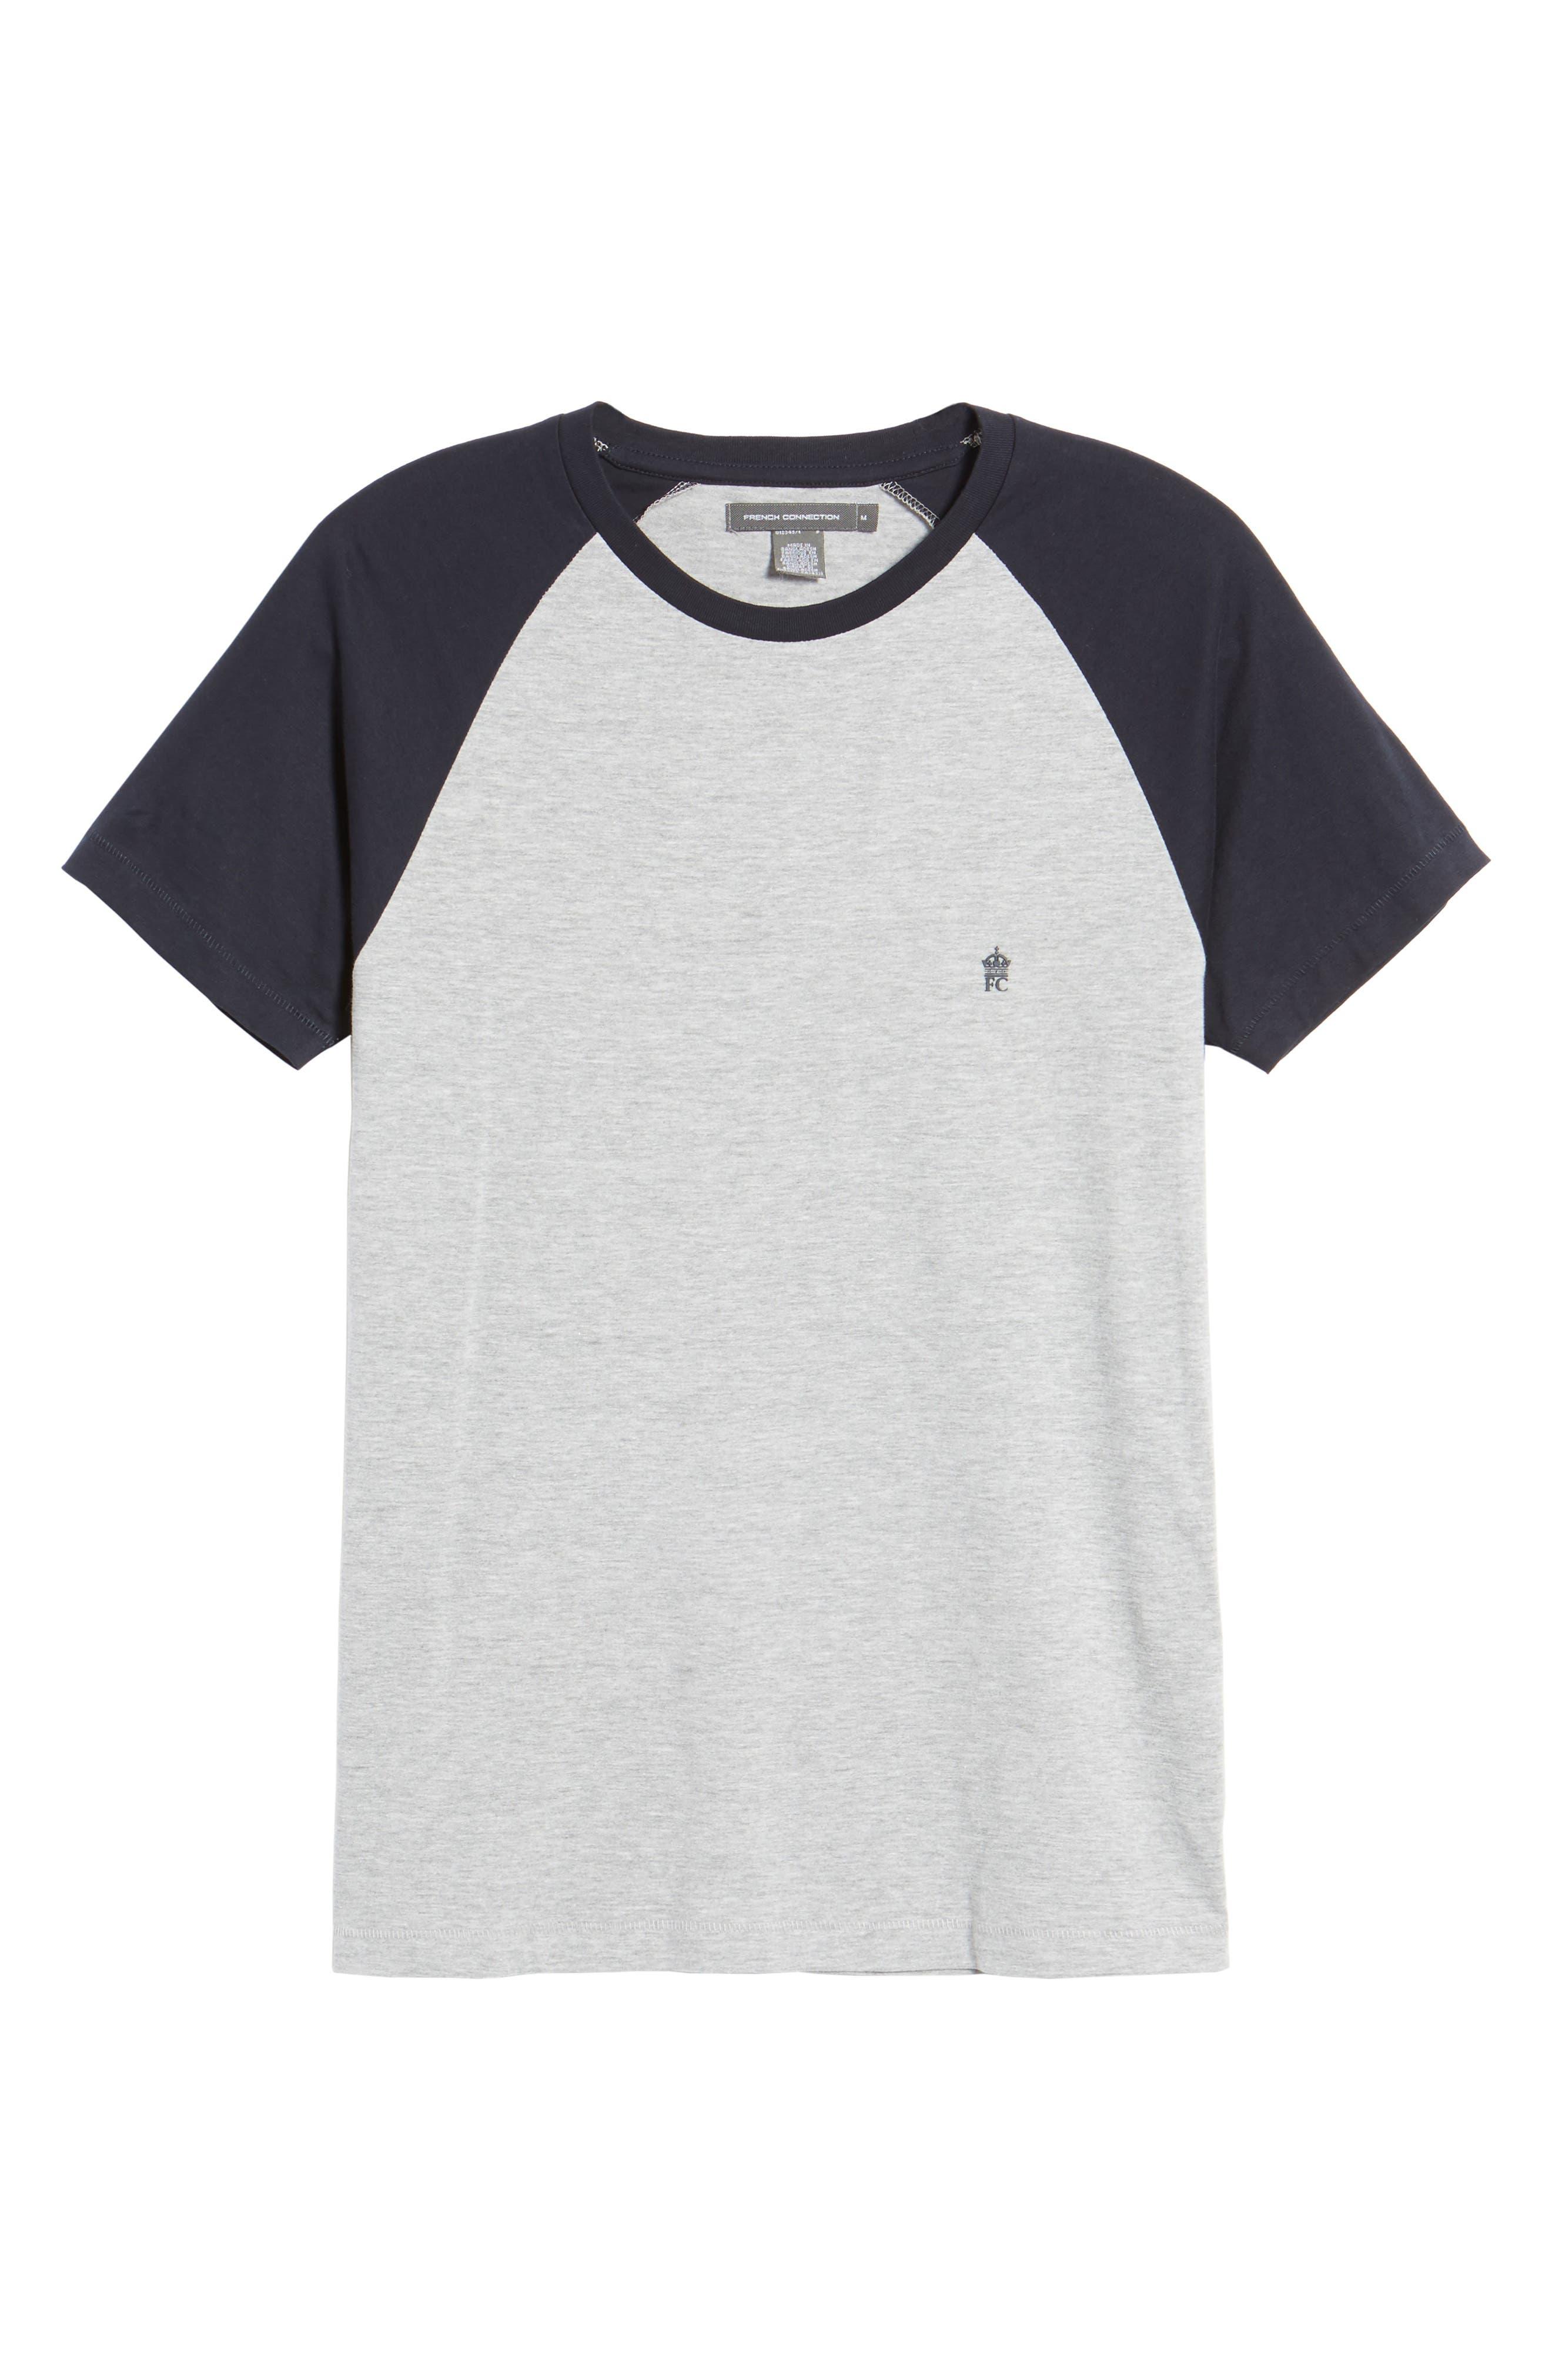 Raglan Short Sleeve T-Shirt,                             Alternate thumbnail 6, color,                             052